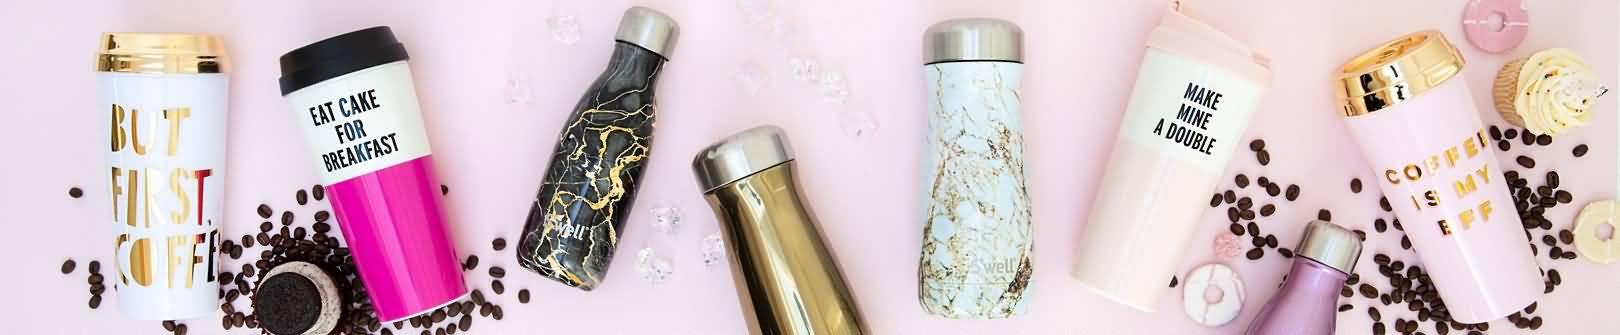 Flasks & Travel Mugs